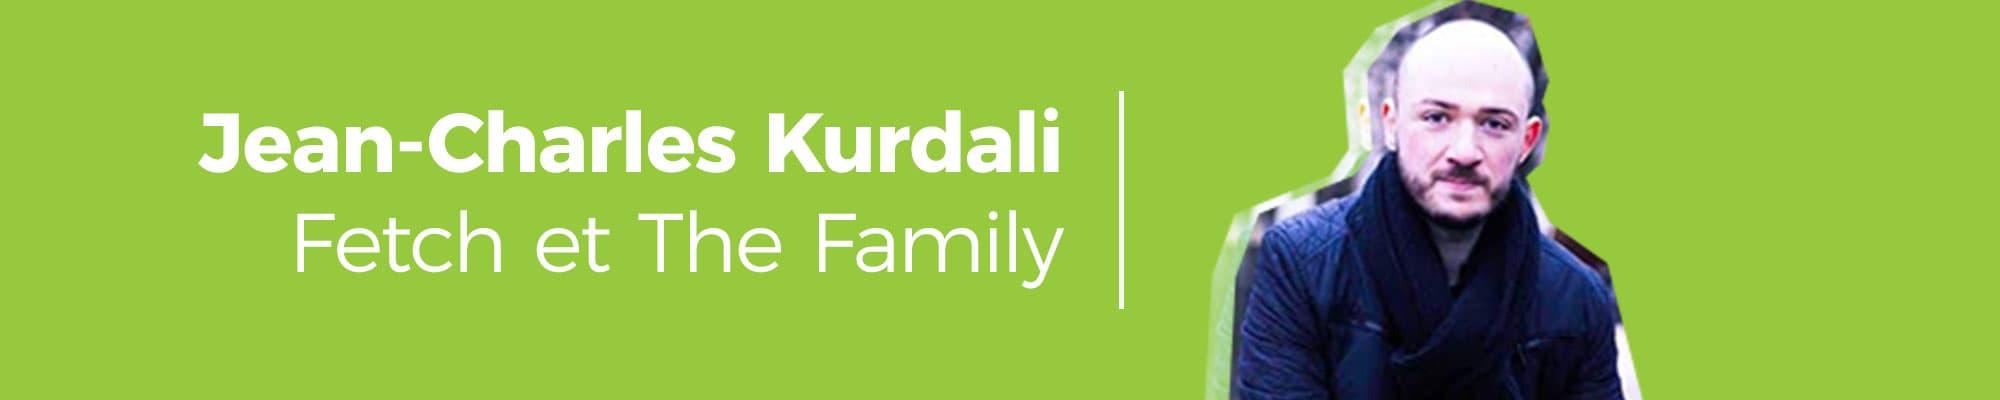 Jean Charles Kurdali entrepreneur inspirant fondateur de Fetch